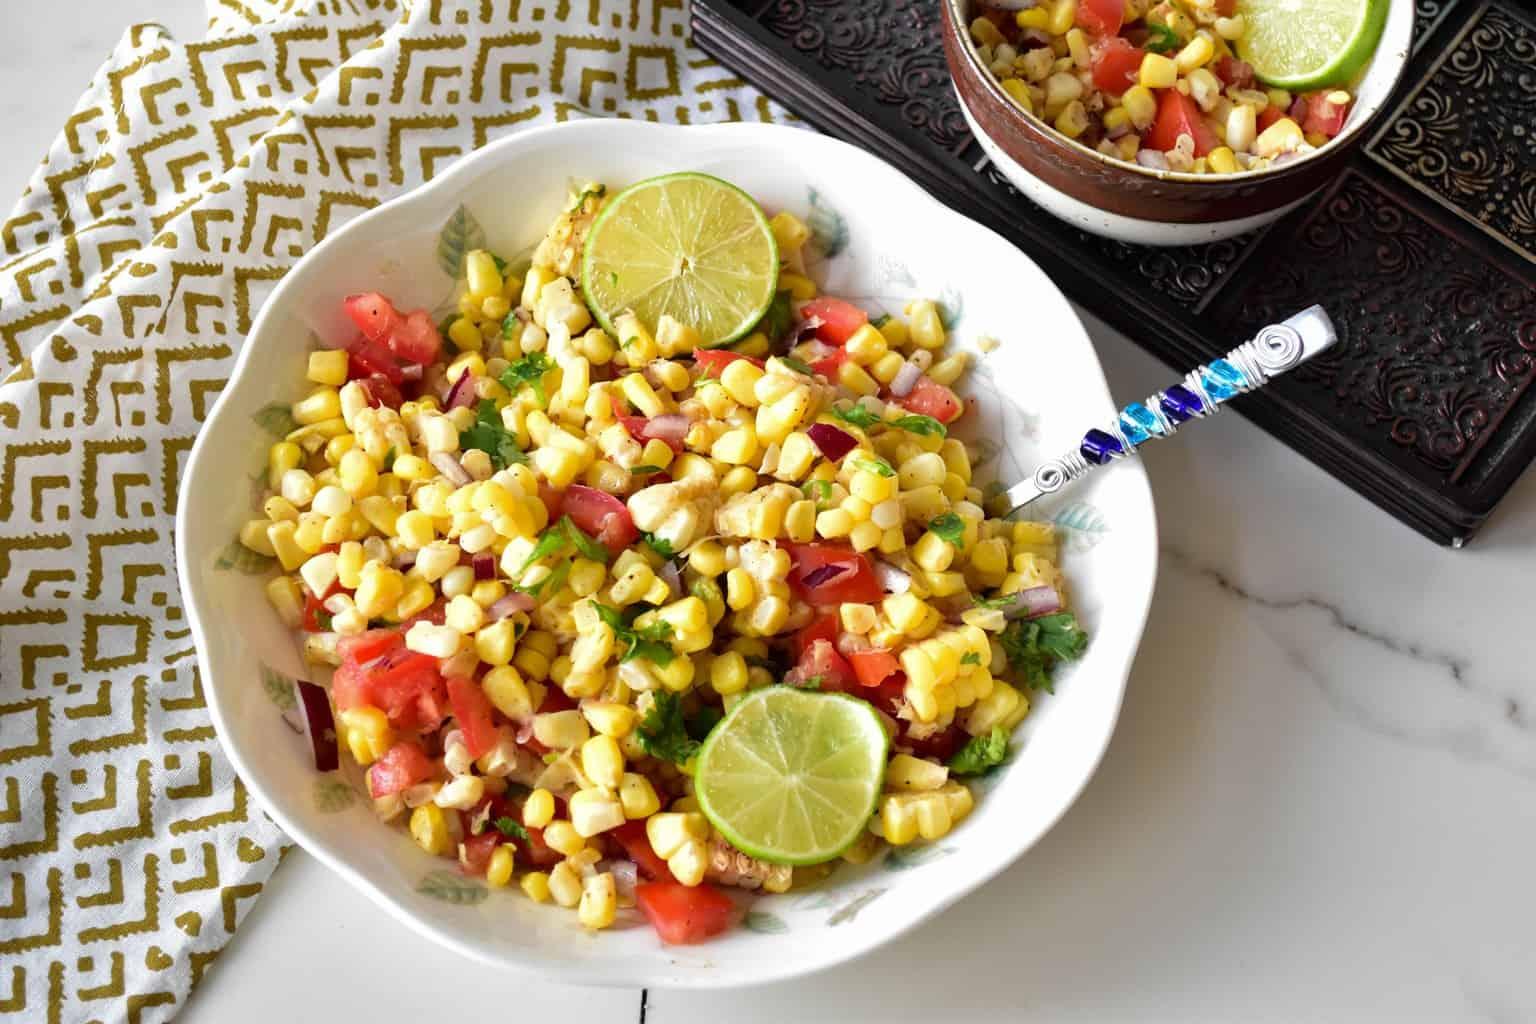 "<img src=""https://cdn.shortpixel.ai/client/q_glossy,ret_img,w_4096,h_2730/Corn chaat.jpg"" alt="" corn chaat a boiled corn salad "">"